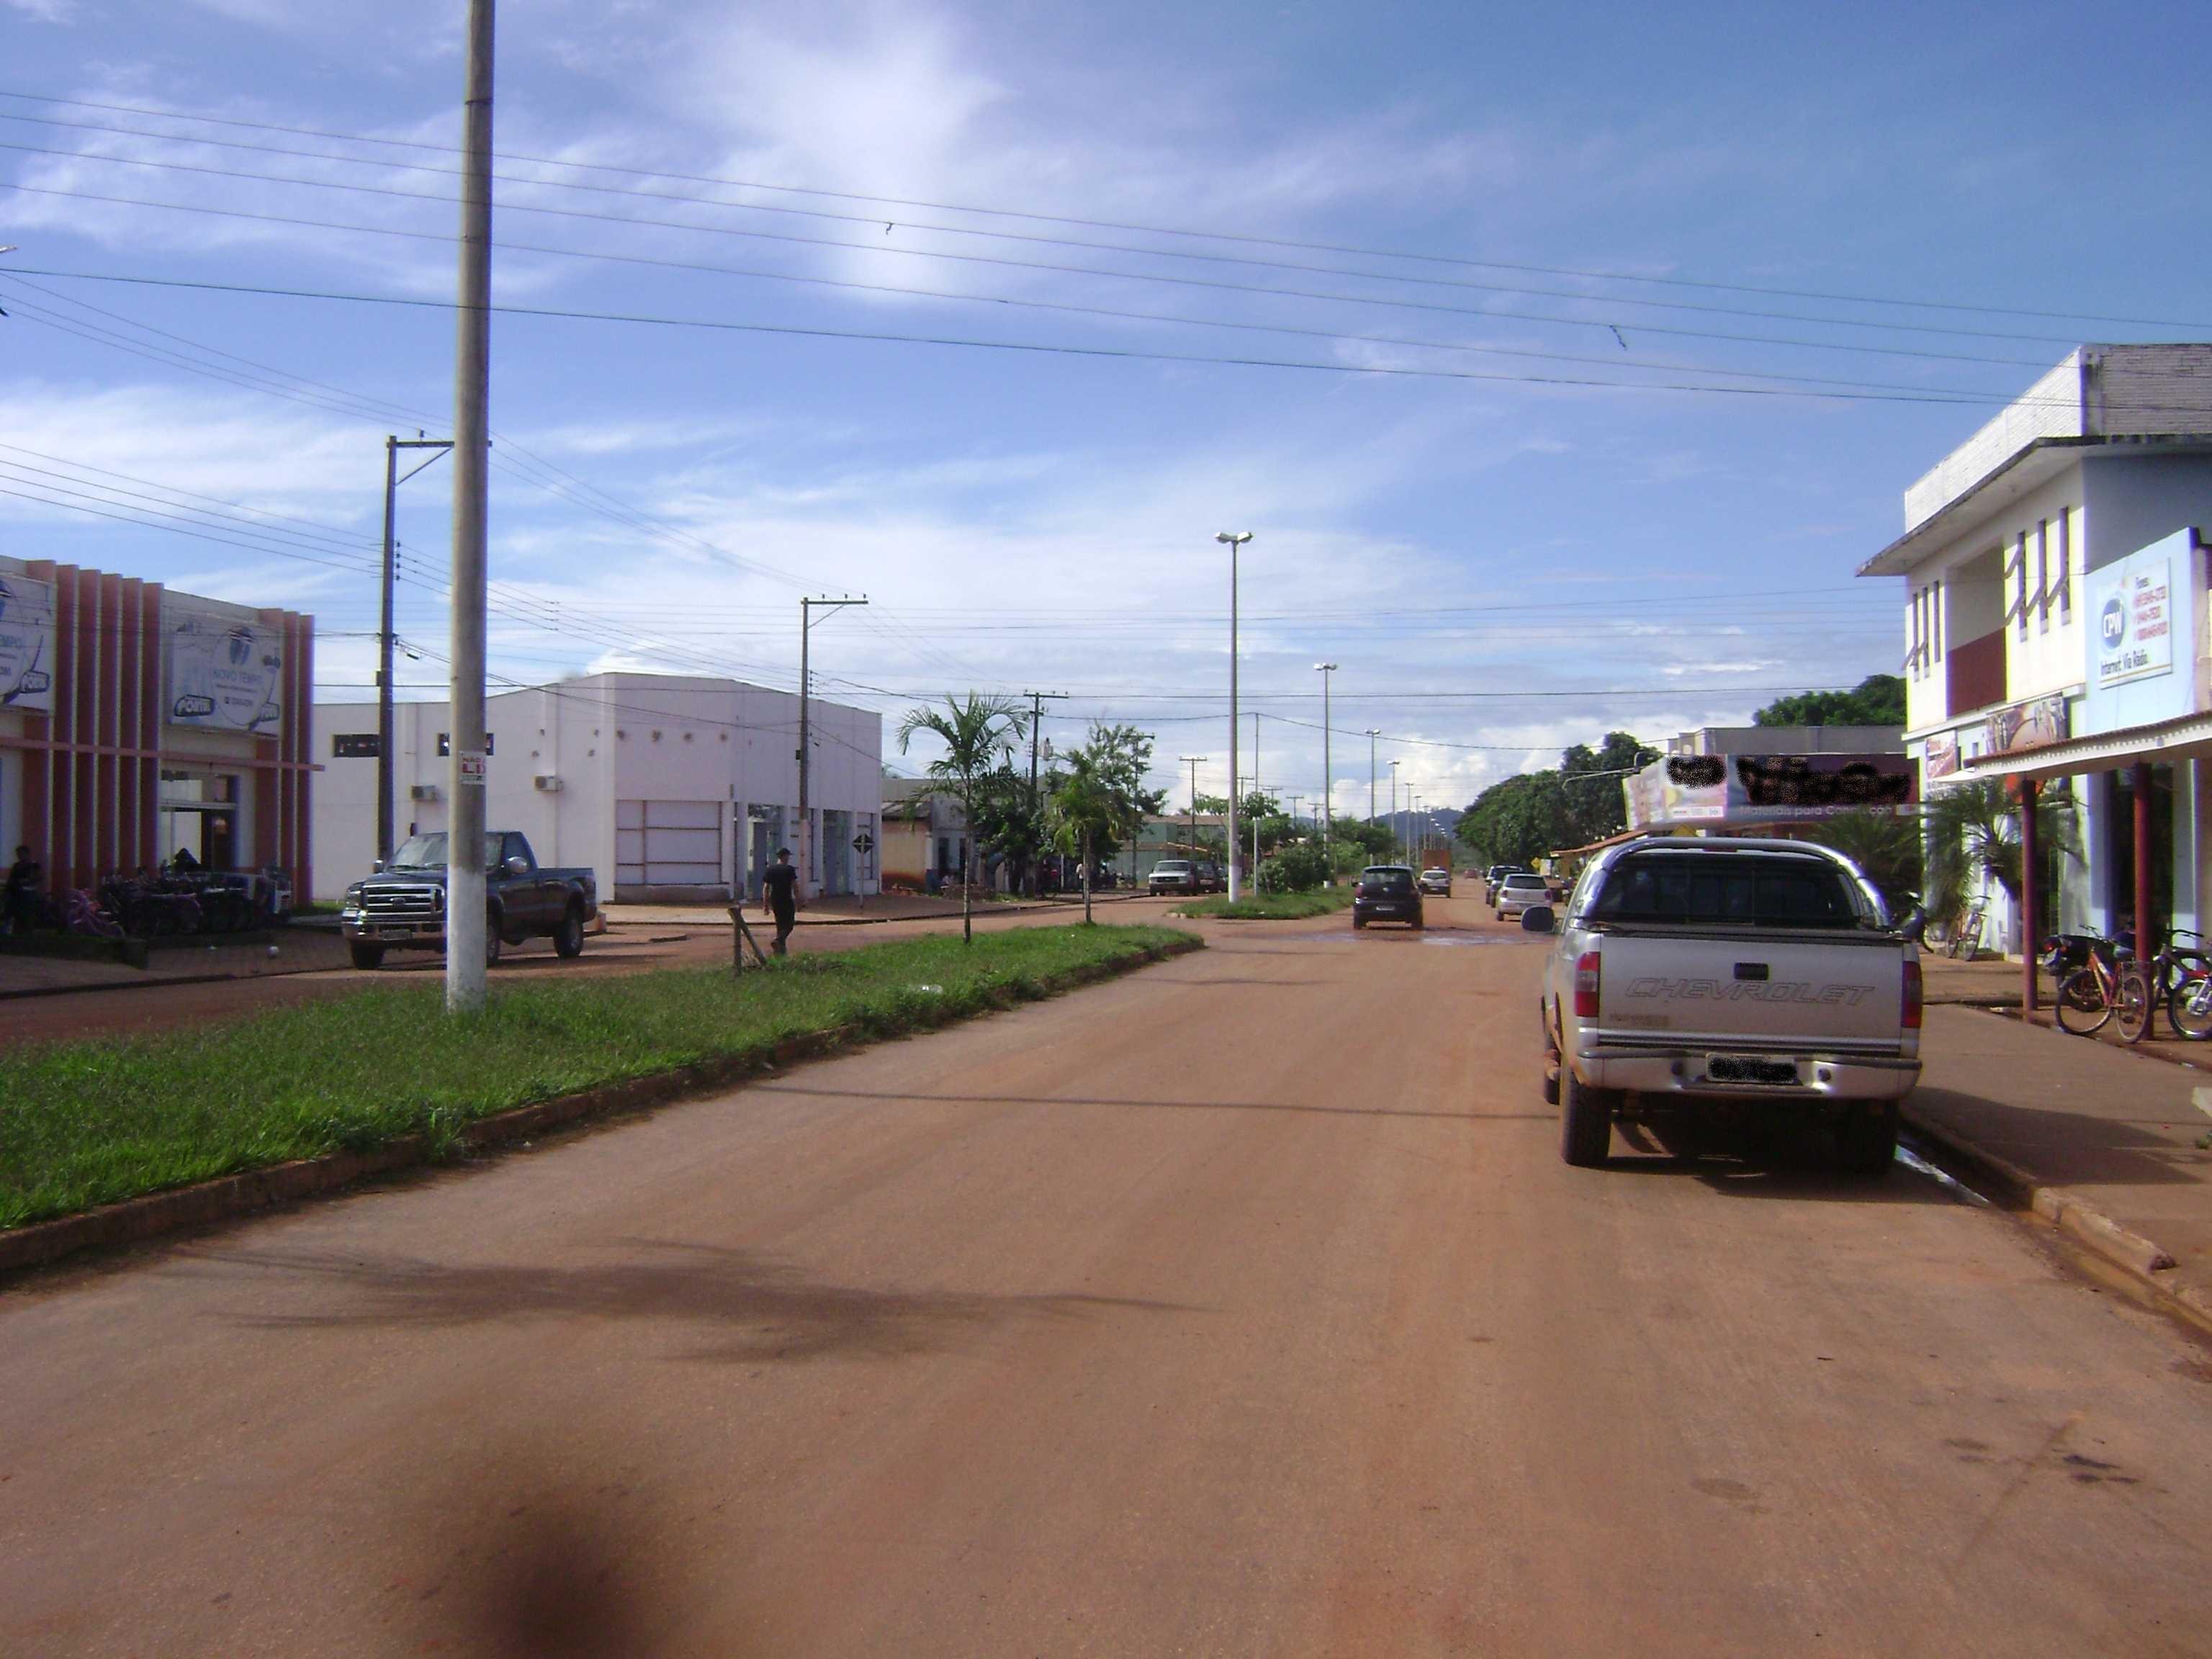 Cabixi Rondônia fonte: upload.wikimedia.org